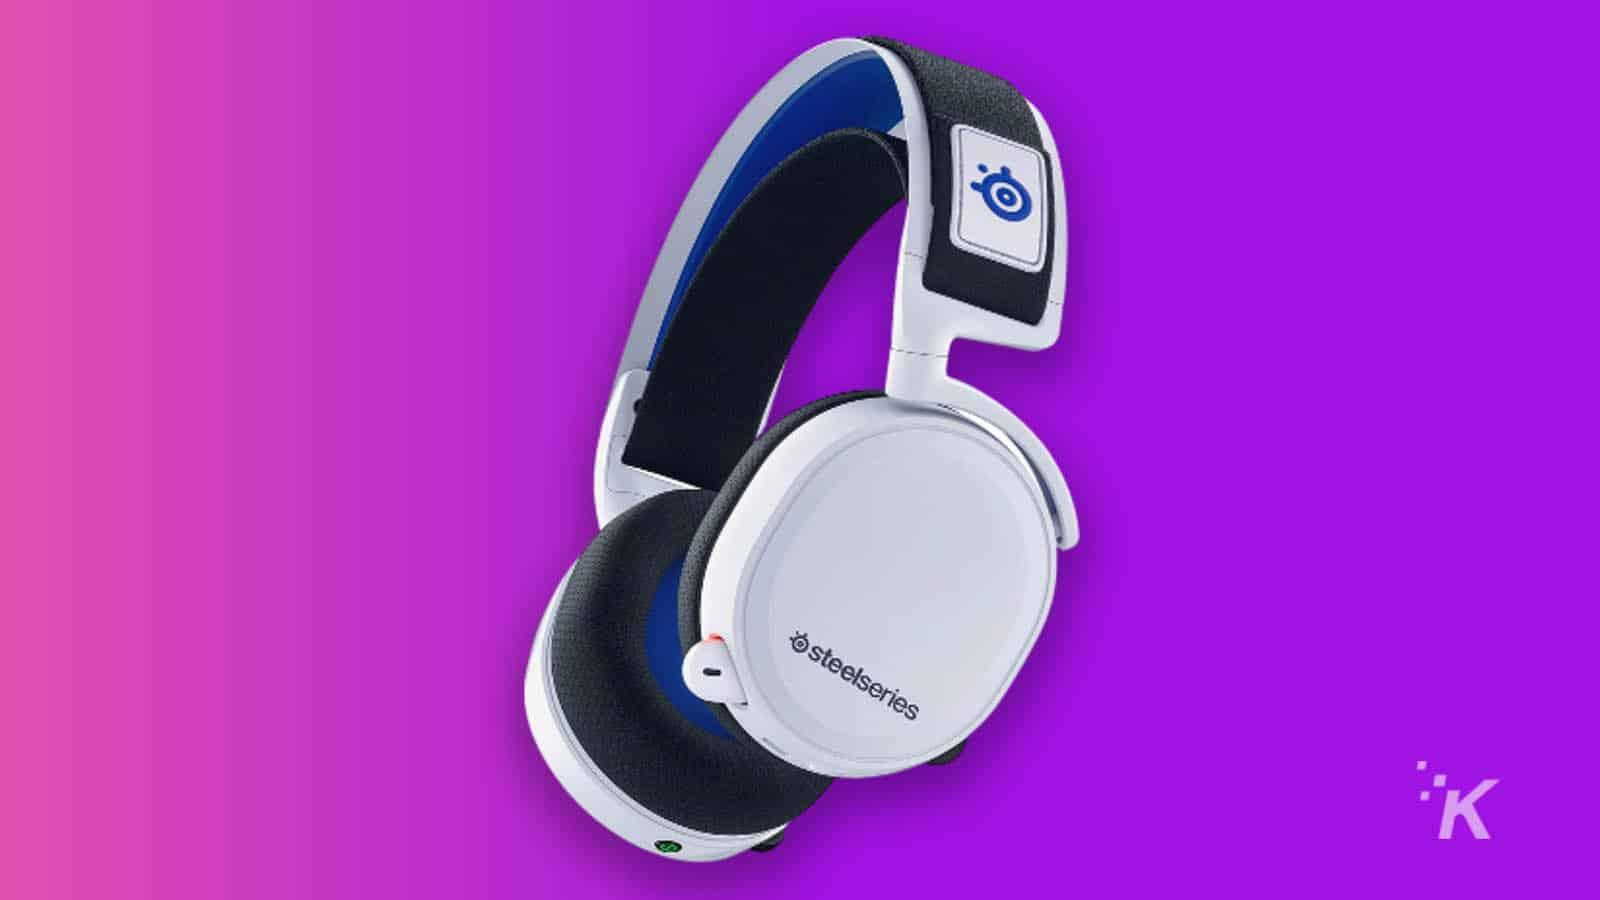 ps5 steelseries headset